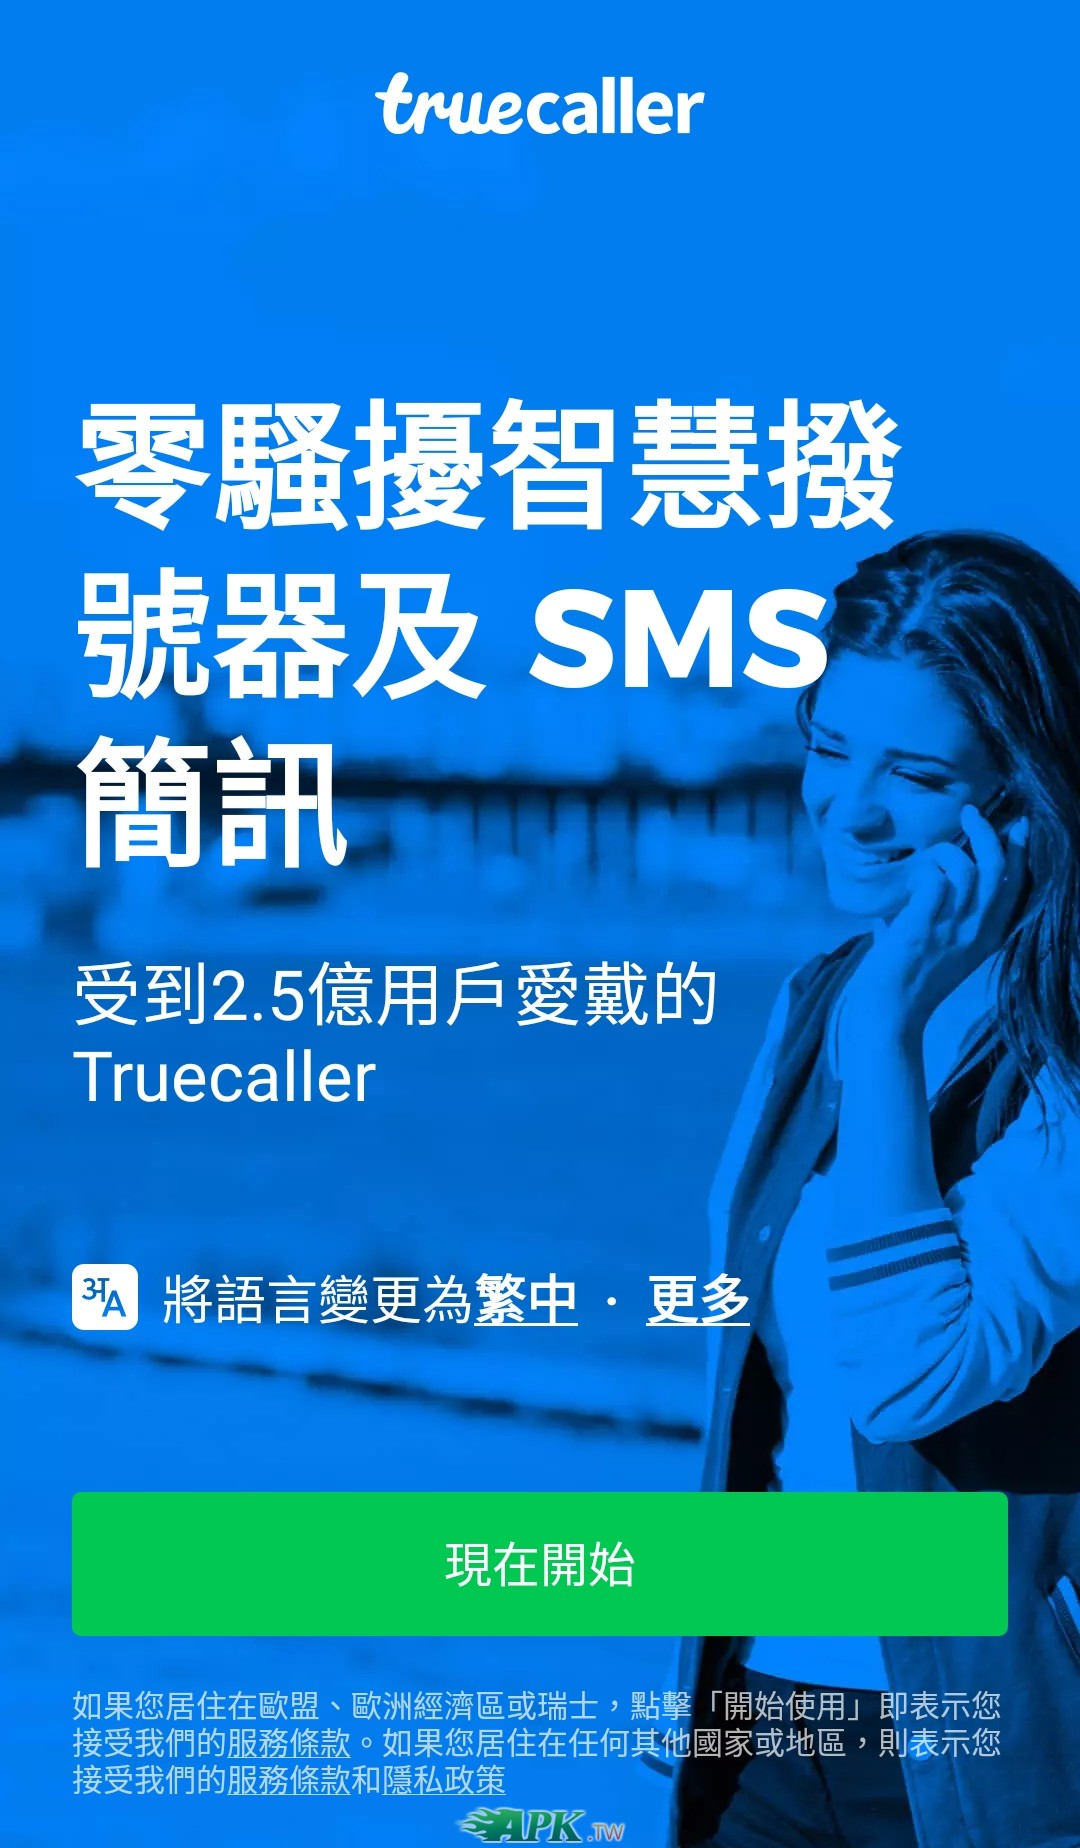 Truecaller_Premium_1.jpg